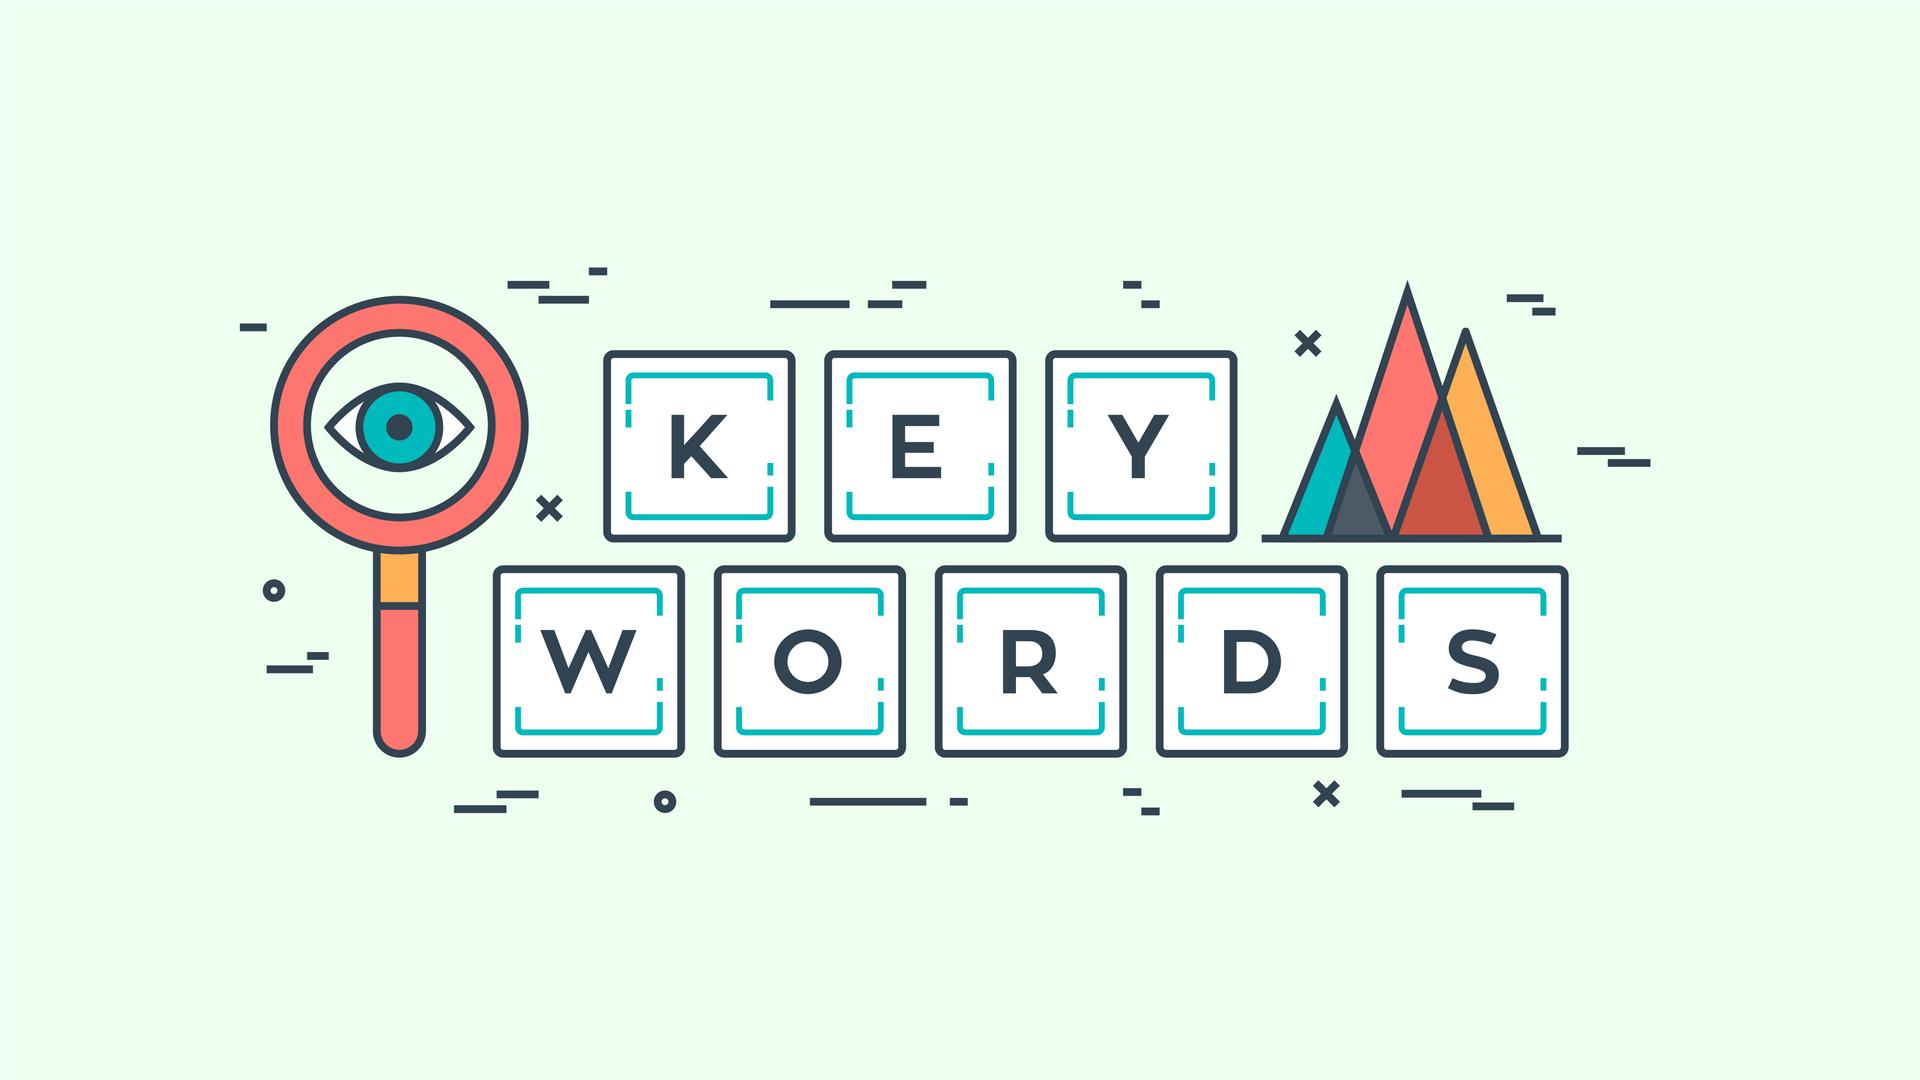 Anahtar Kelime Bulma